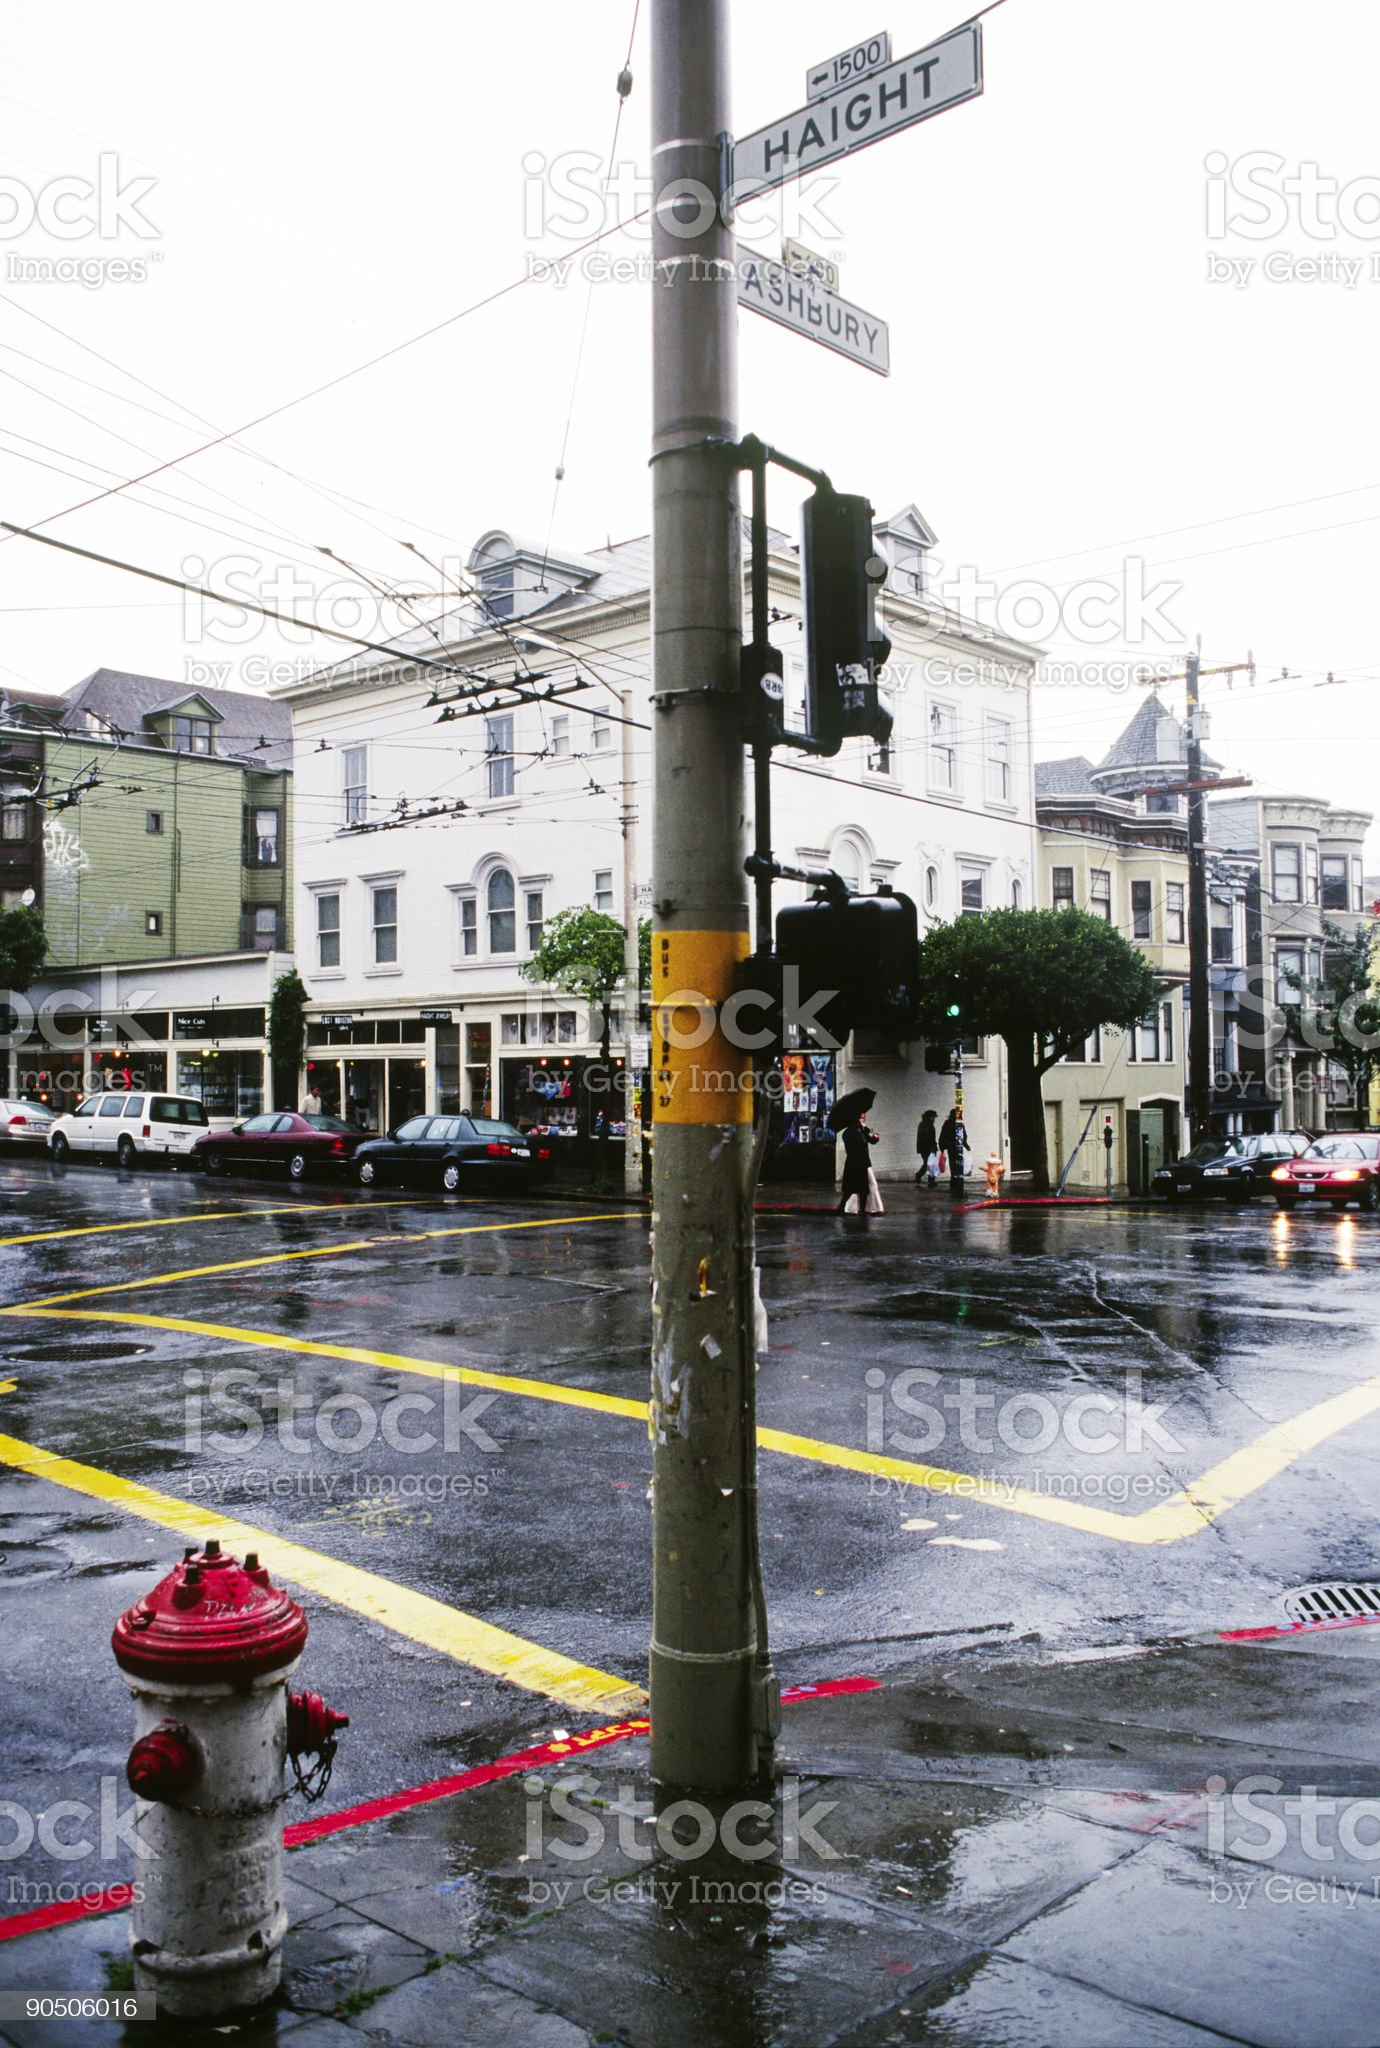 Haight Ashbury District, San Francisco, California royalty-free stock photo